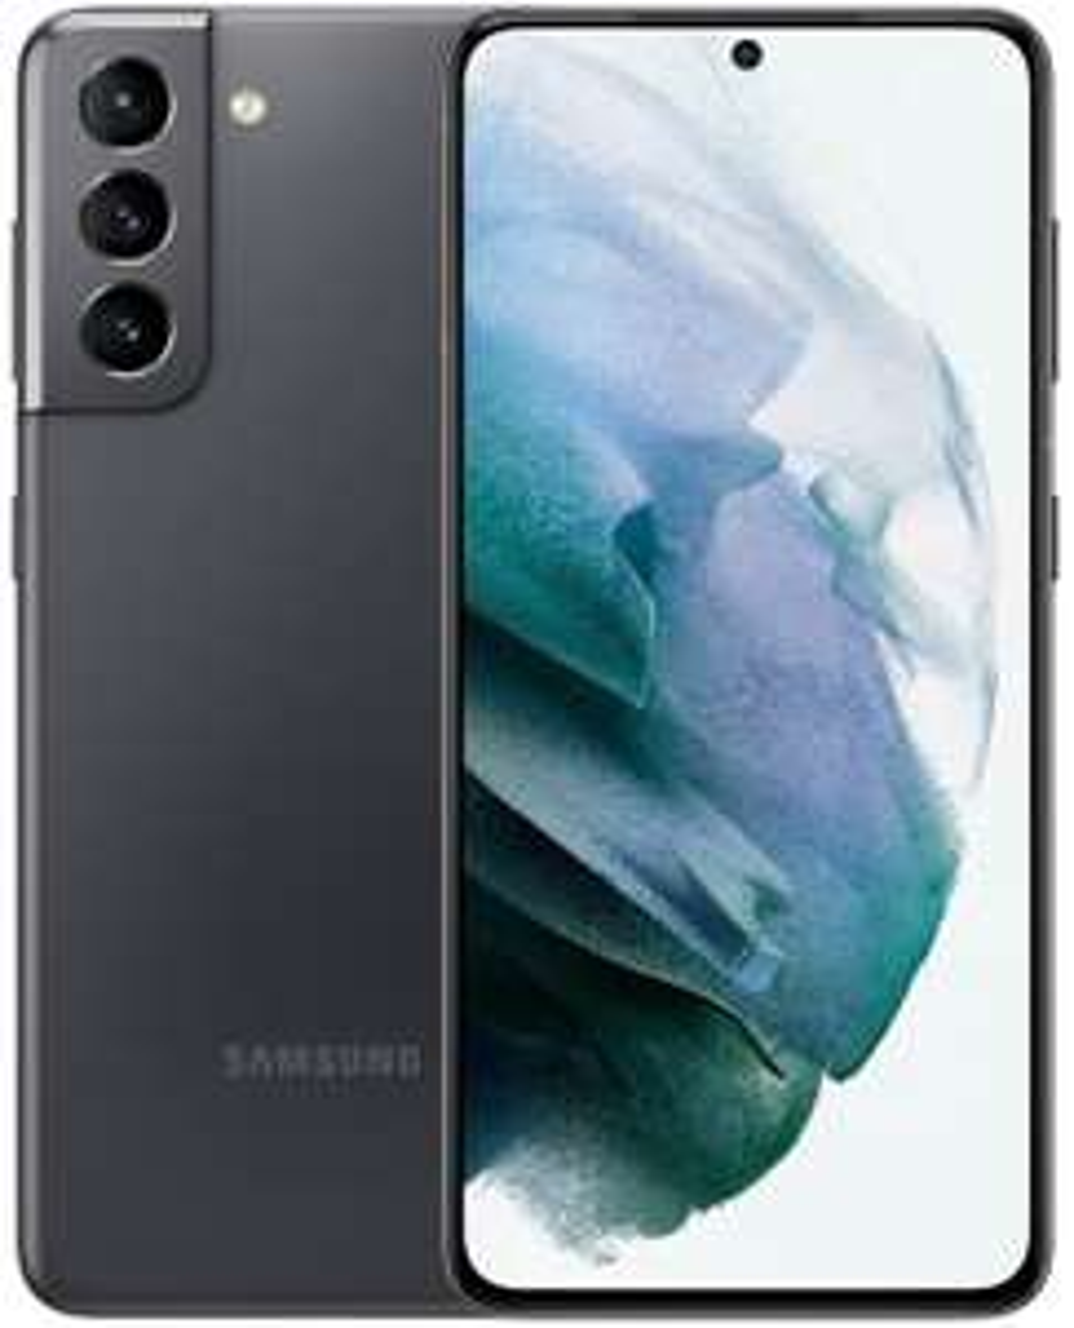 Samsung Galaxy S21 128GB (79€ ZZ) inkl. Galaxy Fit2 od. 256GB (149€ ZZ) mit o2 Free M (20GB LTE, VoLTE & WLAN Call) für mtl. 29,99€